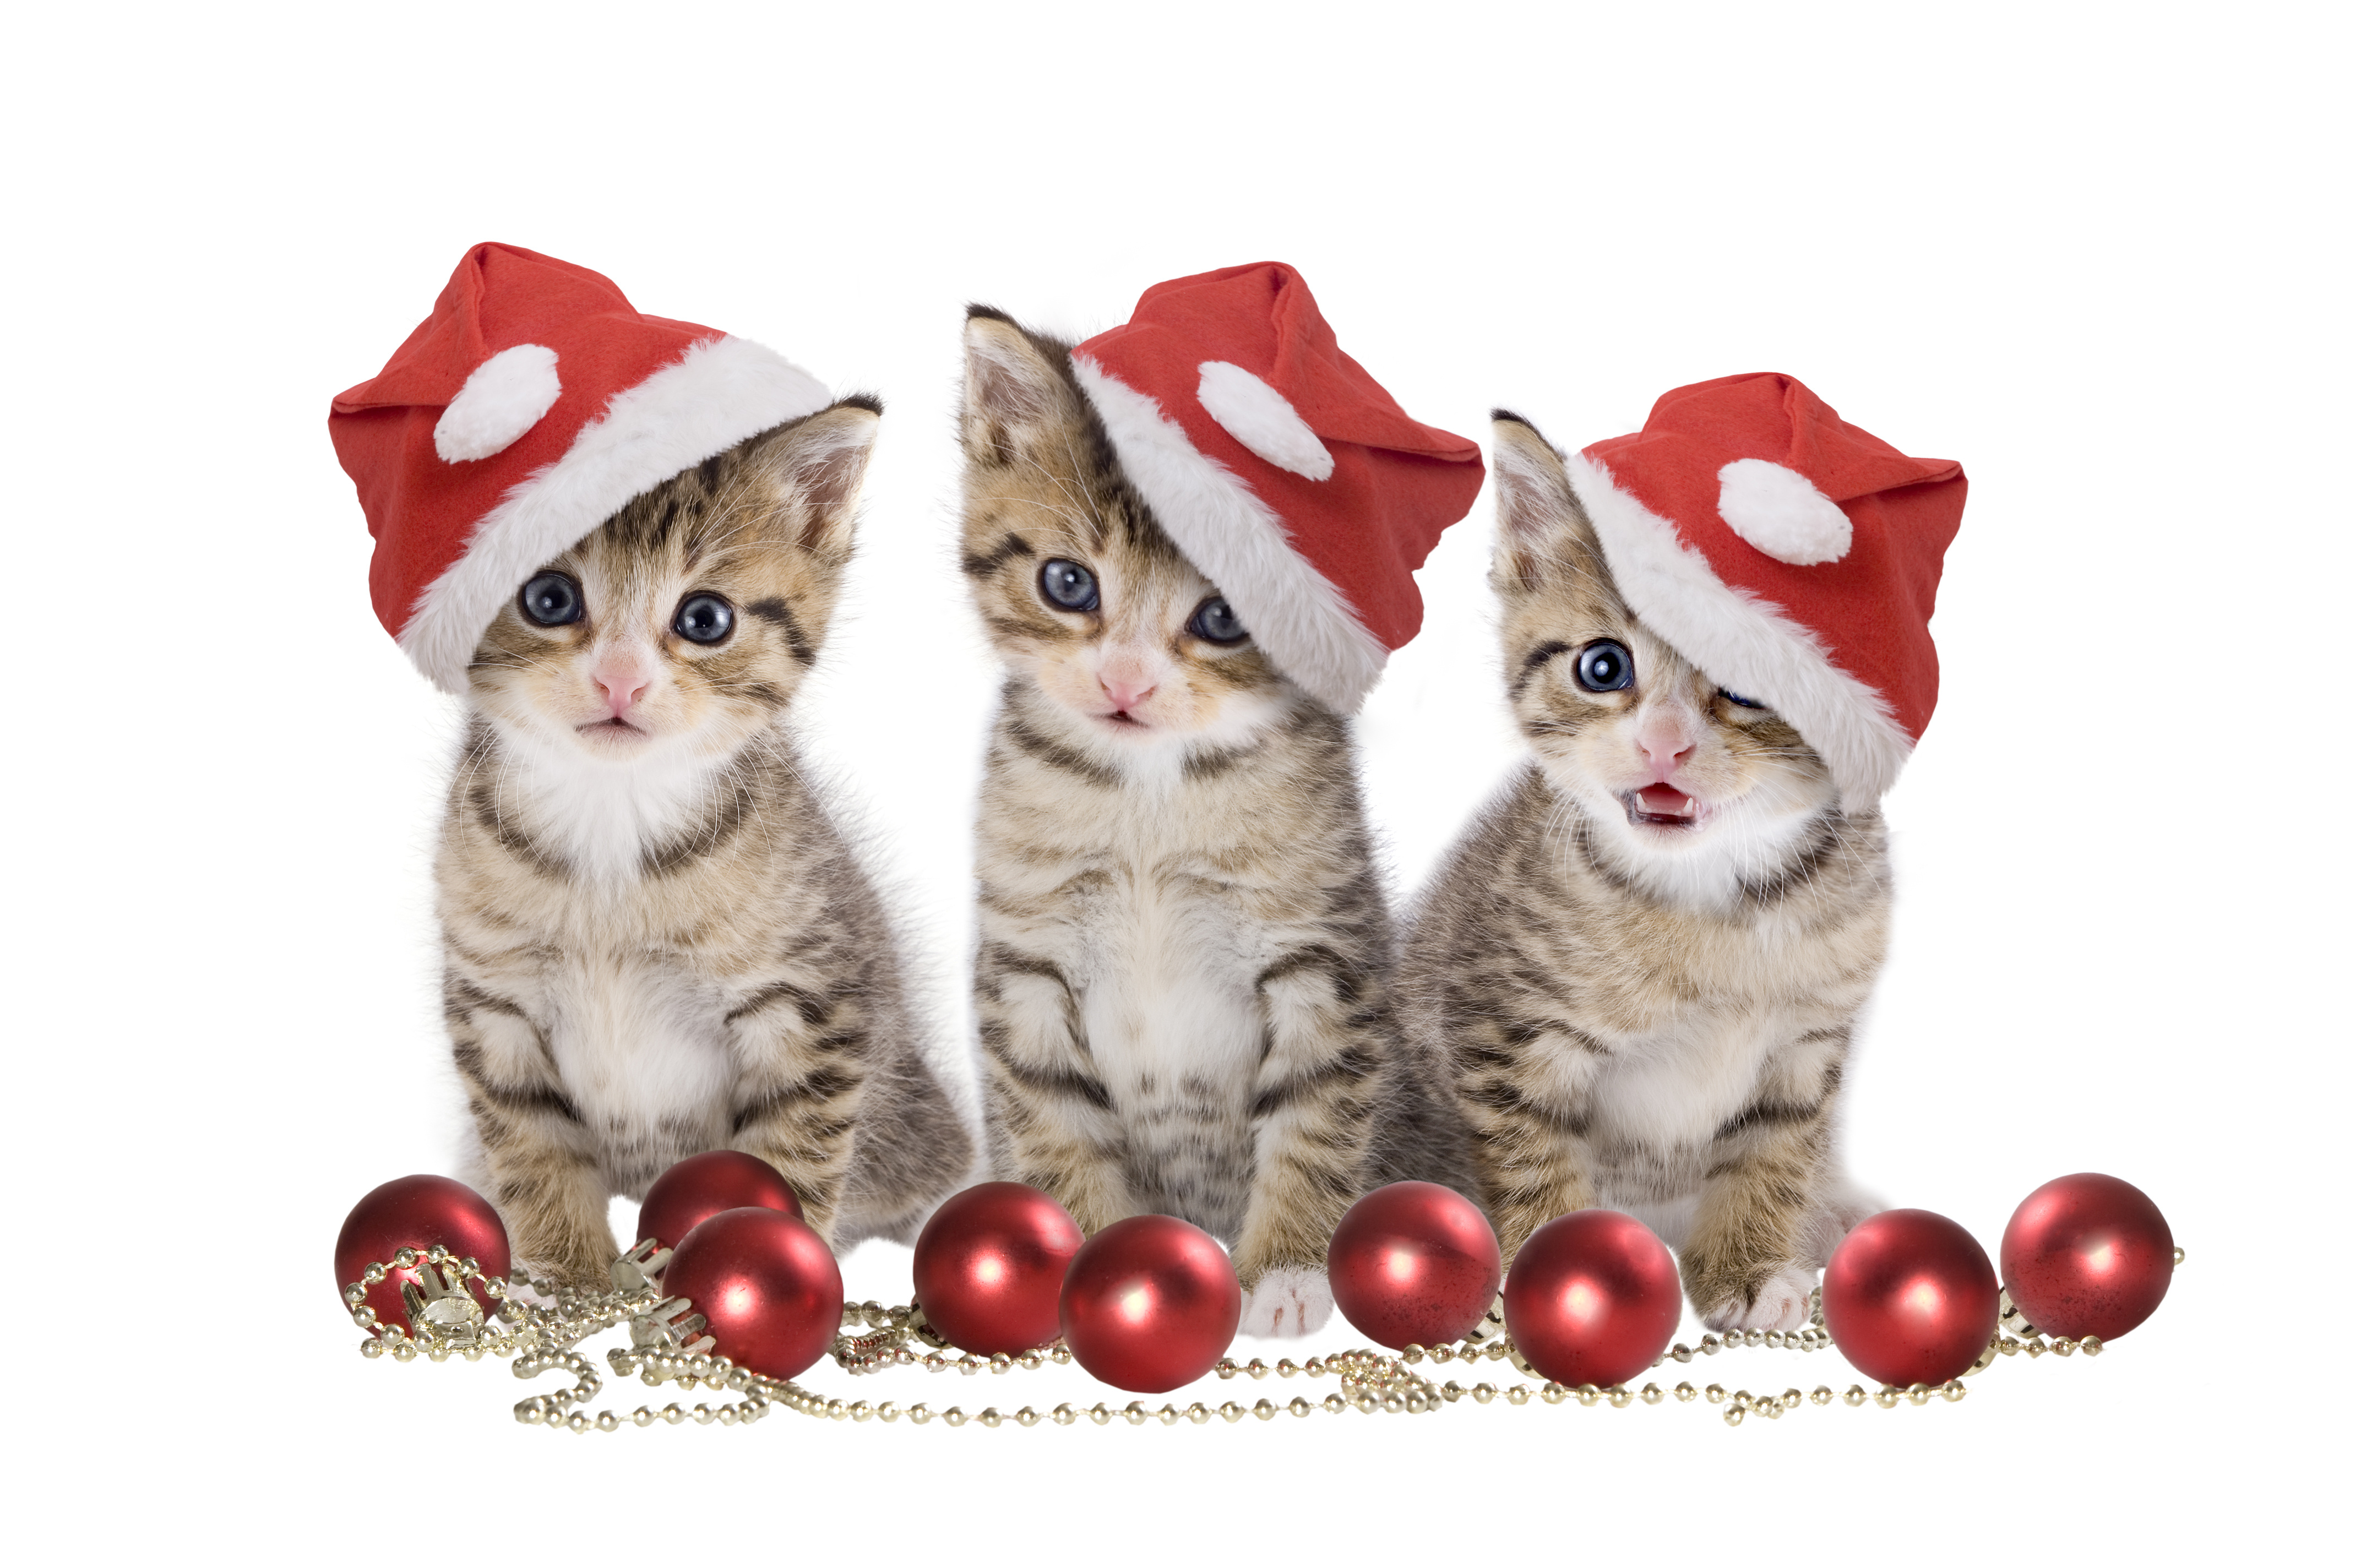 Christmas Cats wallpaper   ForWallpapercom 4288x2848